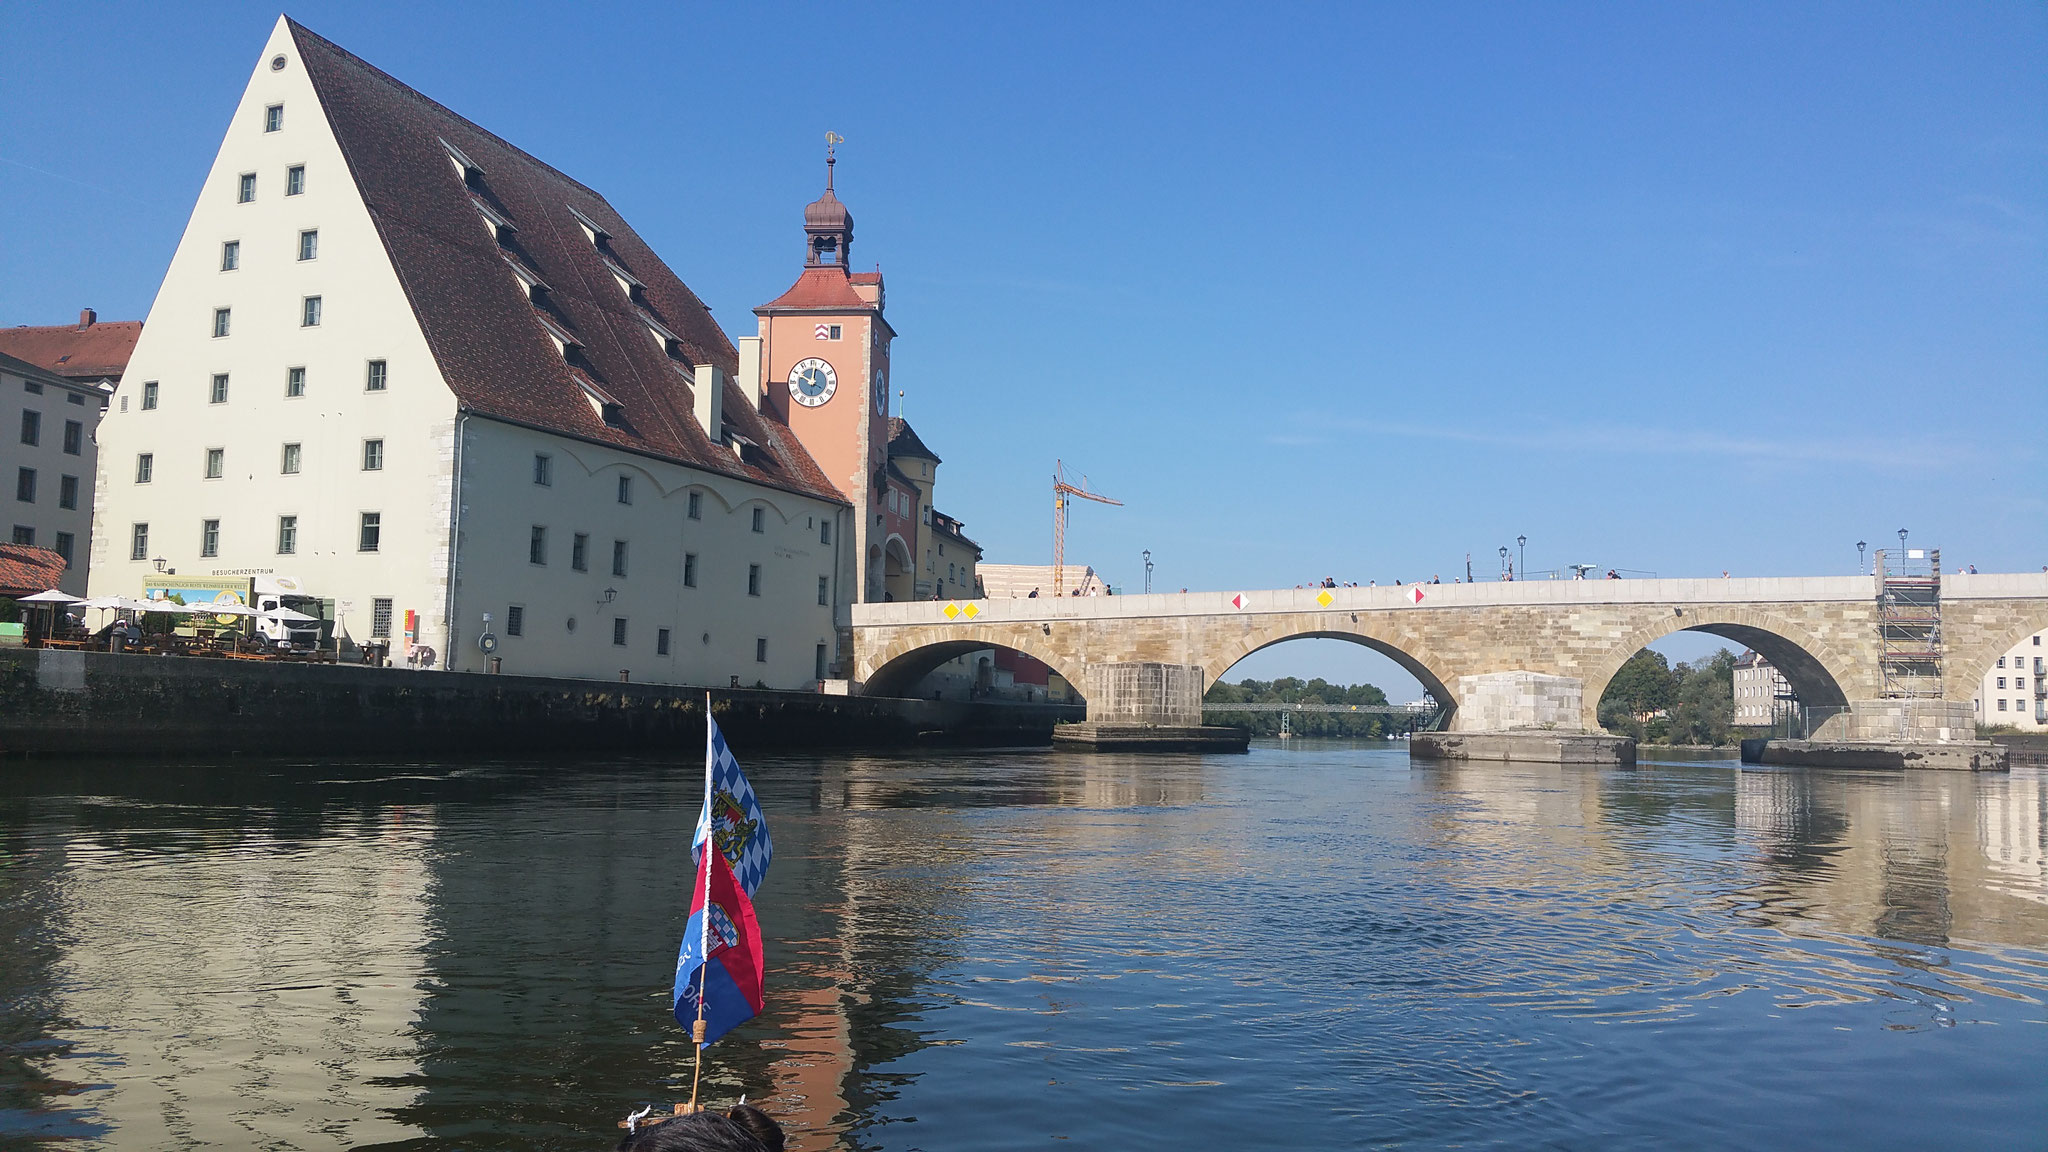 Regensburg/ Steinerne Brücke